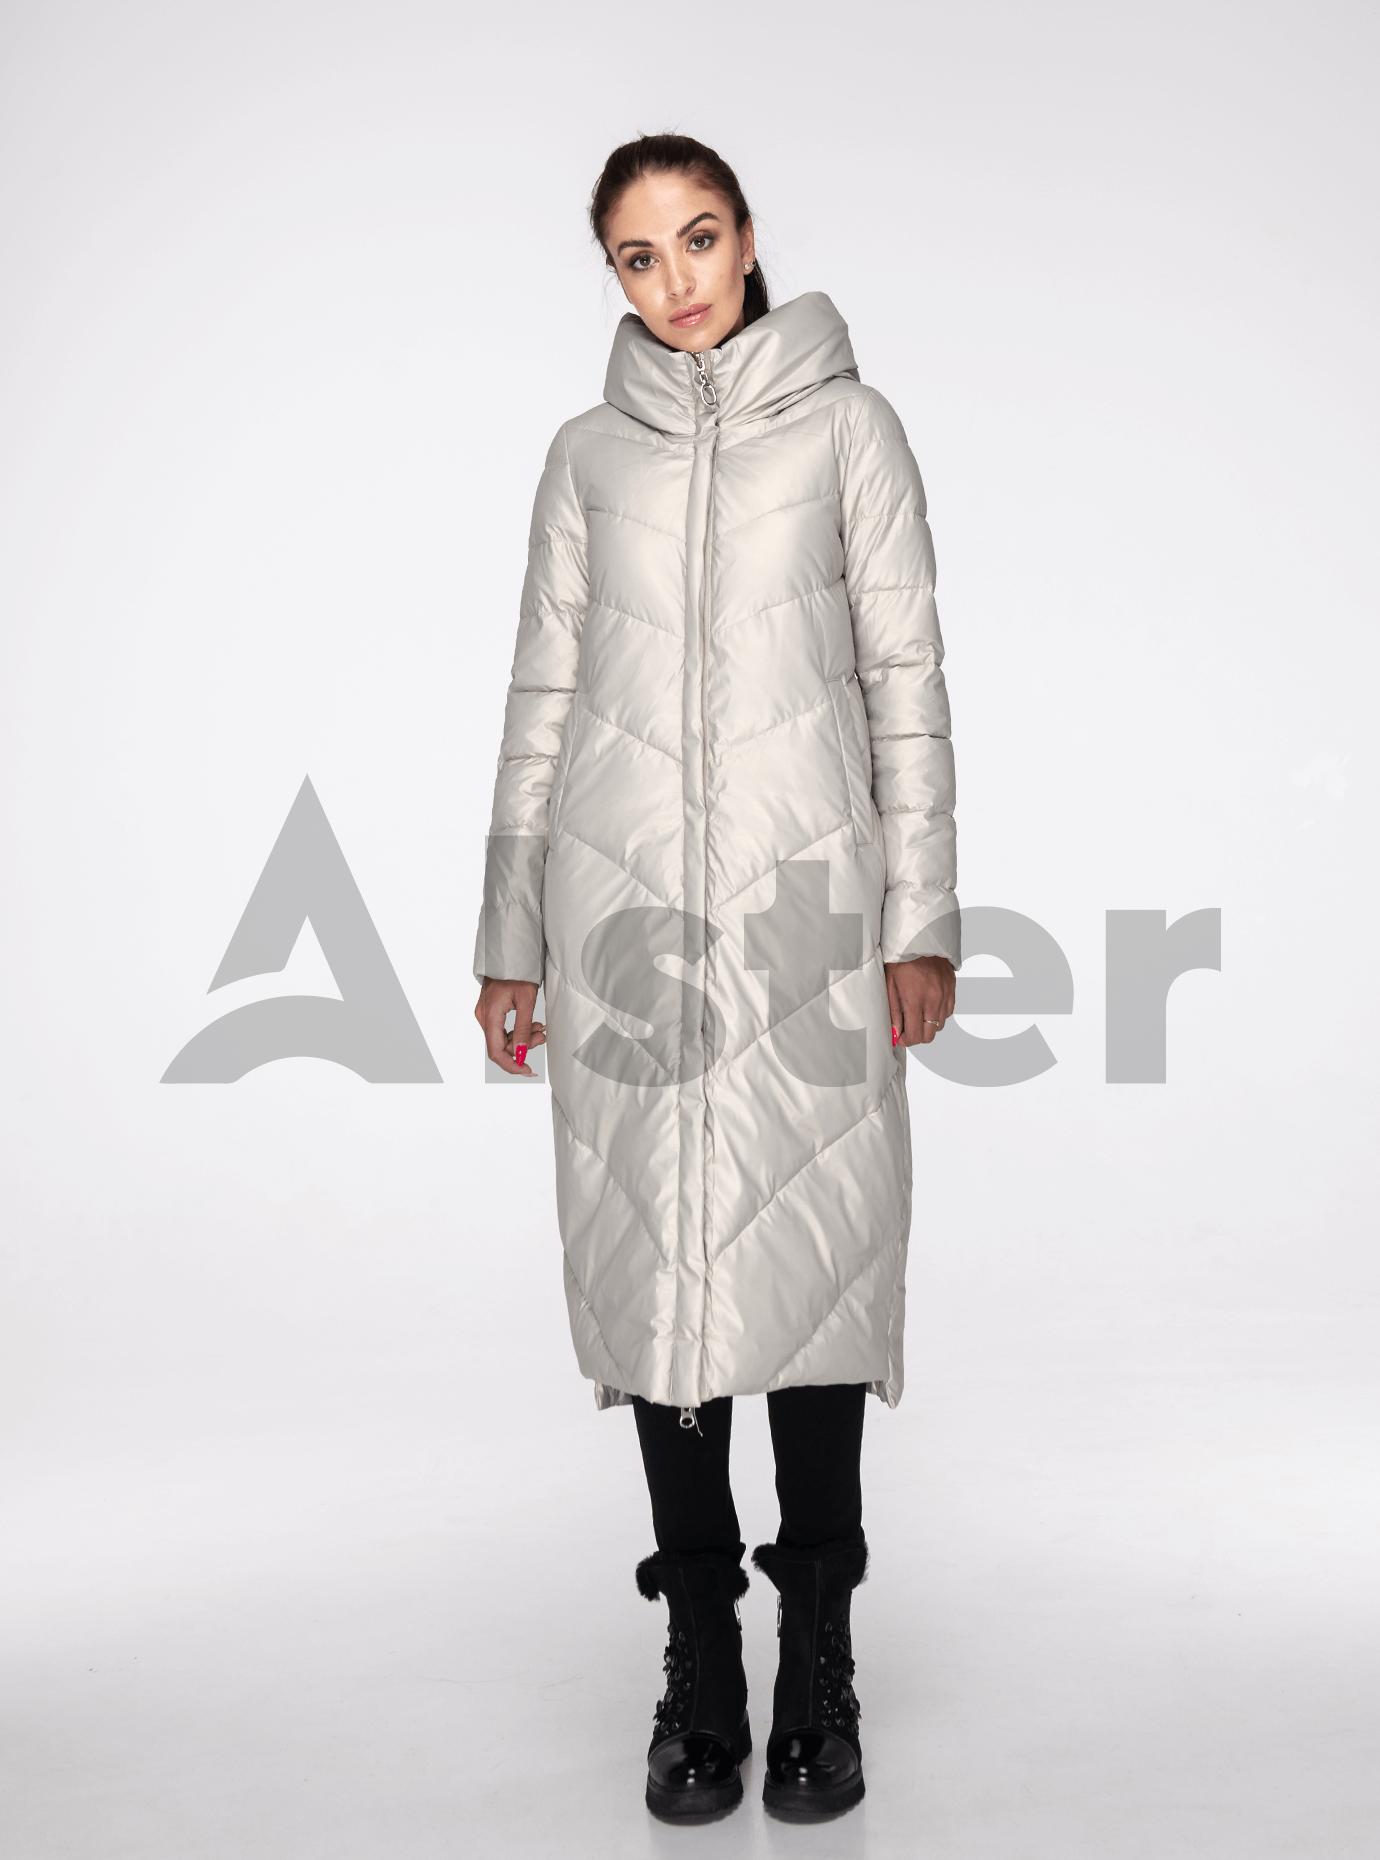 Куртка зимова пряма з капюшоном Бежевий S (05-ZL2240): фото - Alster.ua